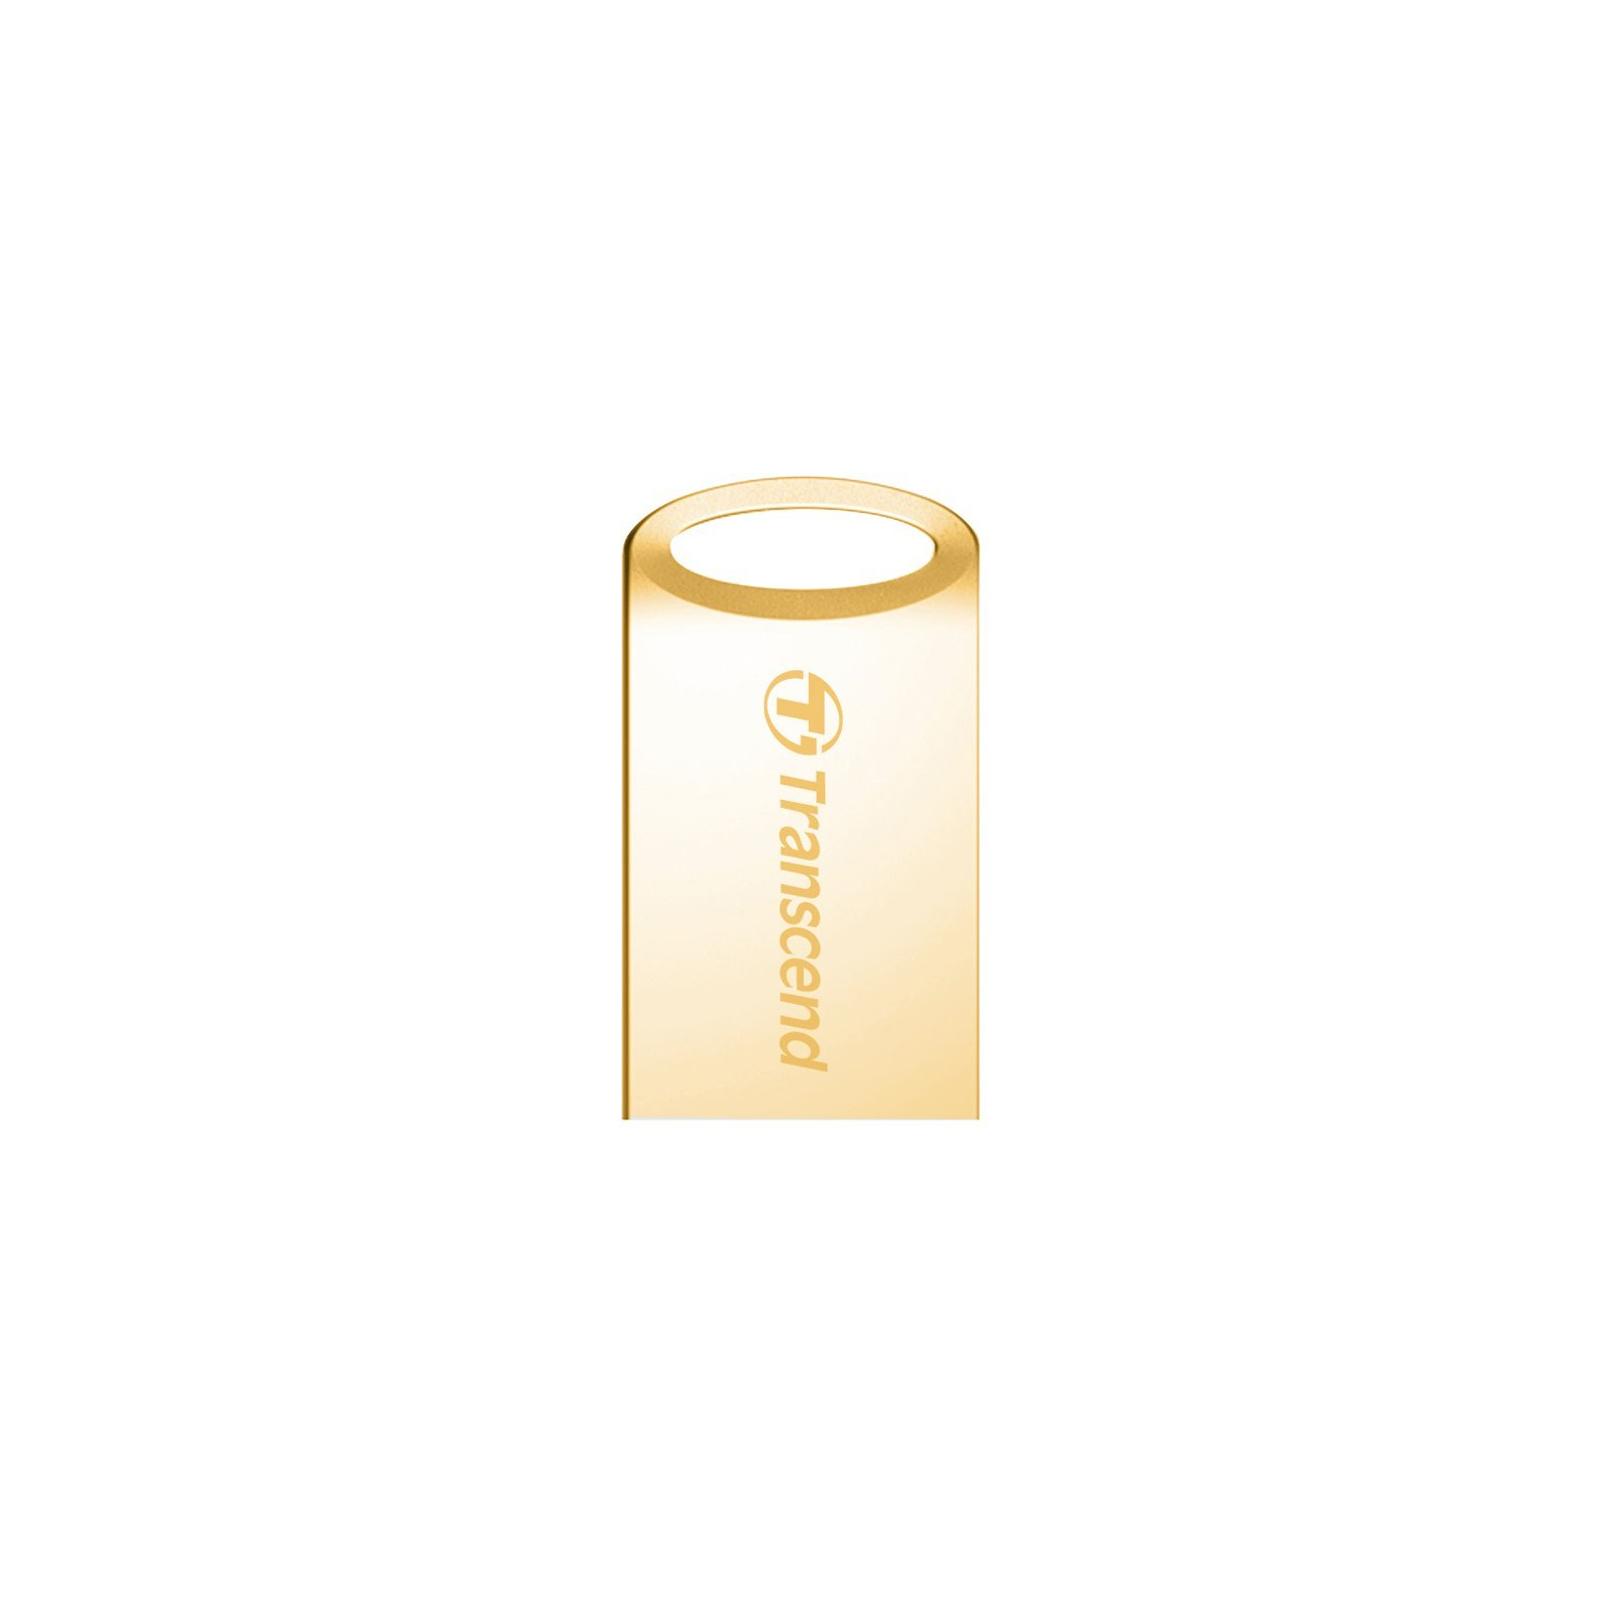 USB флеш накопитель Transcend JetFlash 510, Gold Plating (TS32GJF510G)